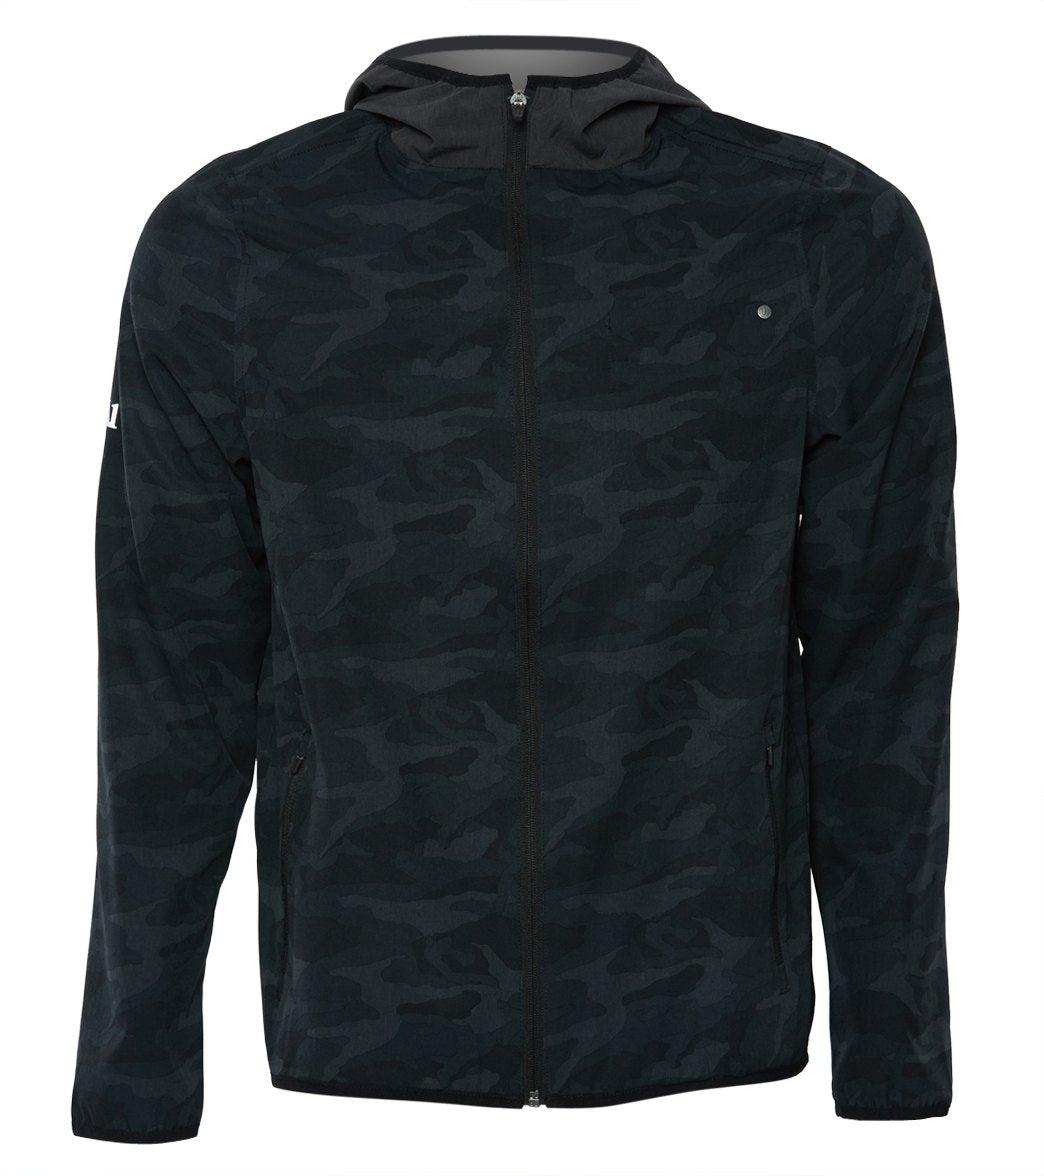 Vuori Men's Outdoor Trainer Shell - Camo Black - Large Spandex Moisture Wicking